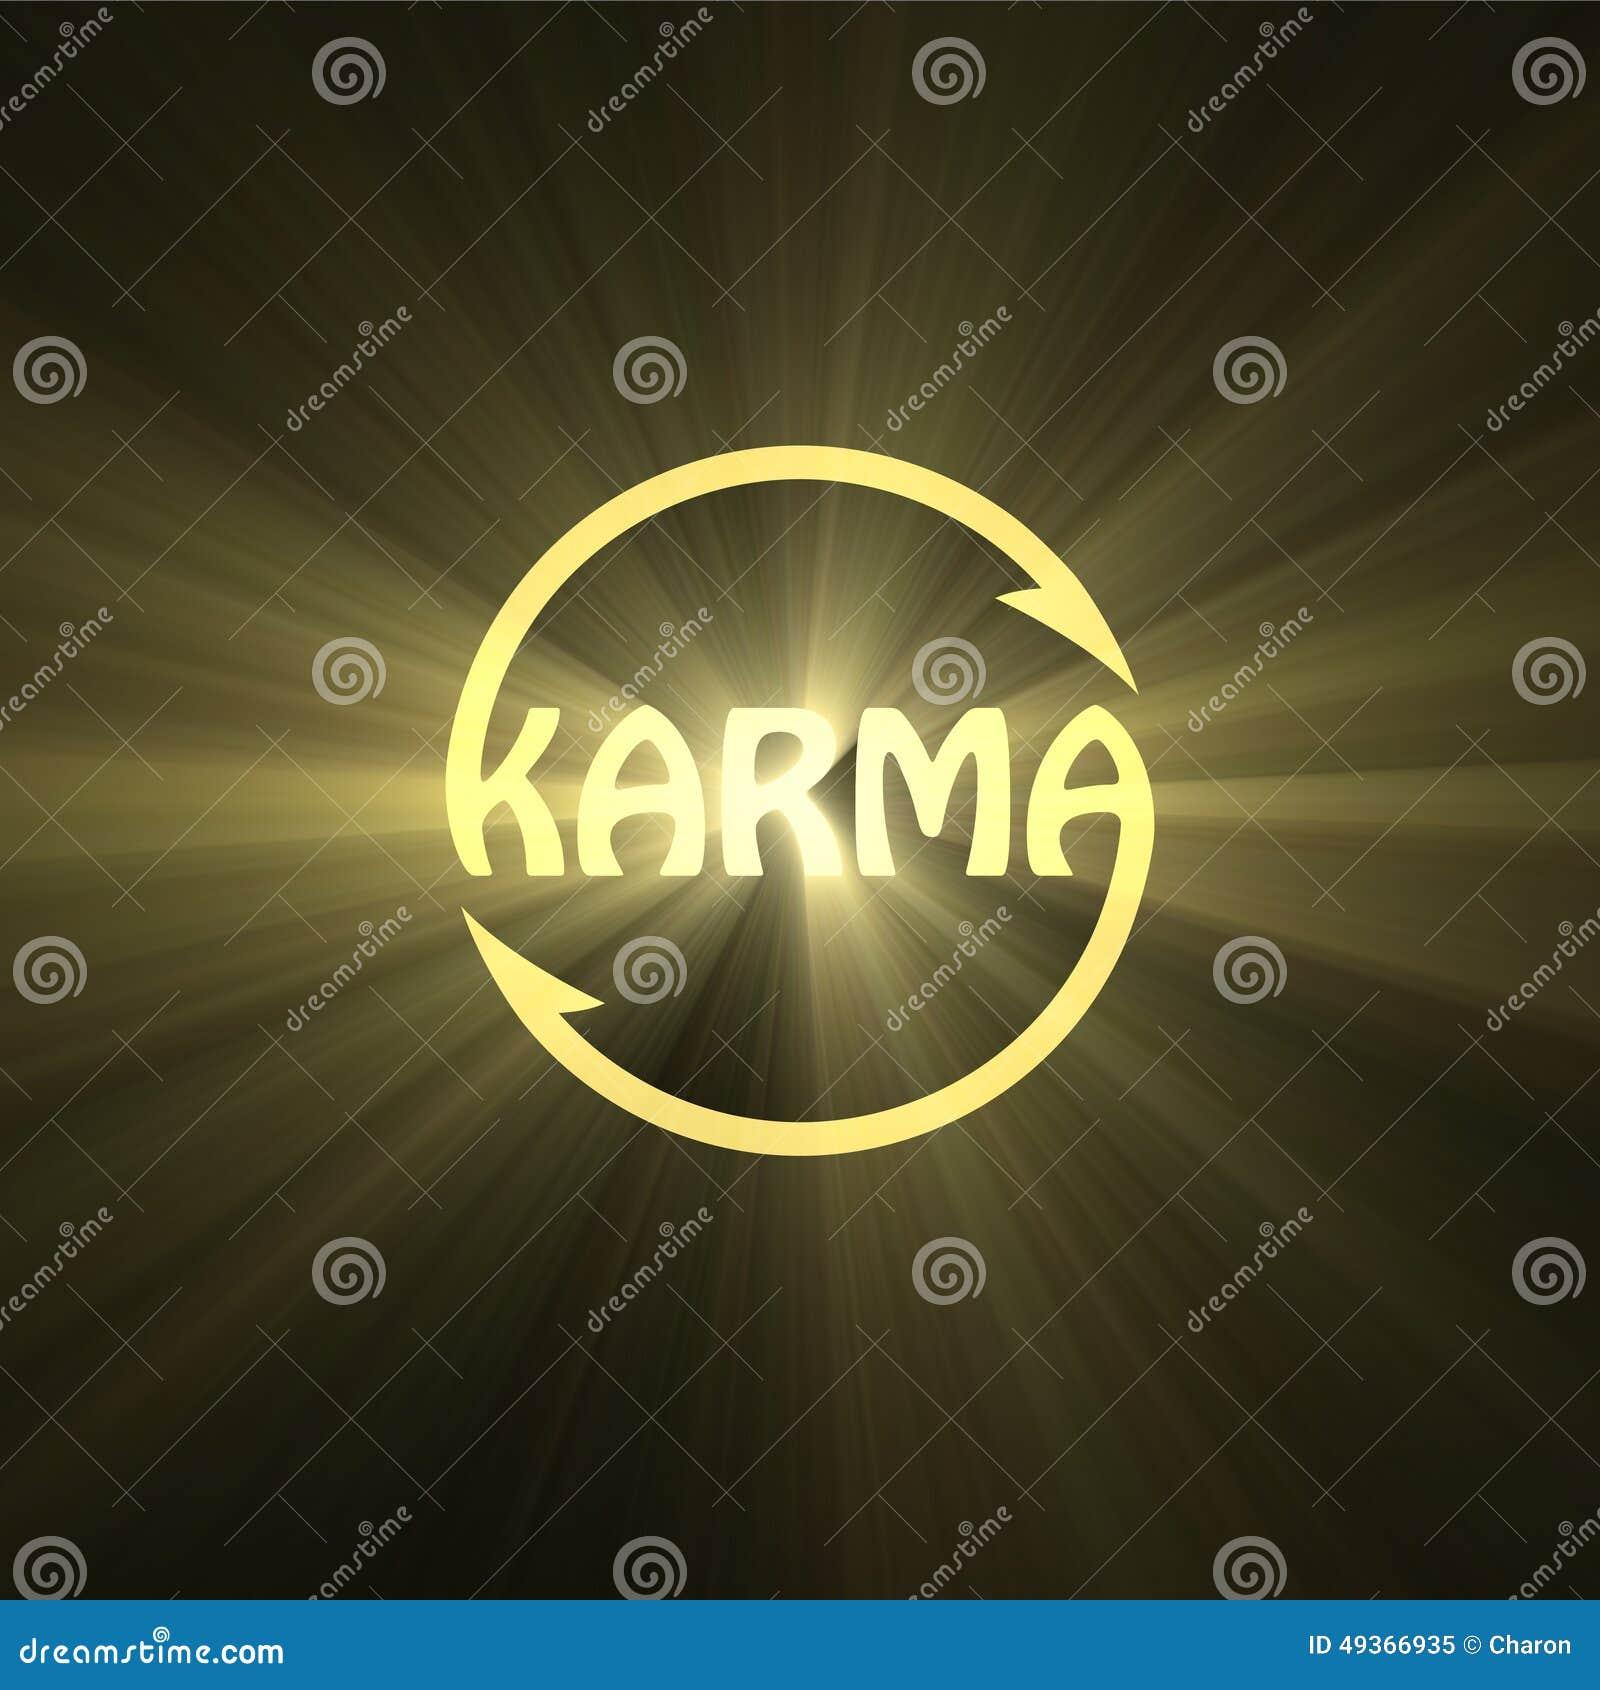 Karma letter buddhism sign light flare stock illustration karma letter buddhism sign light flare buycottarizona Gallery